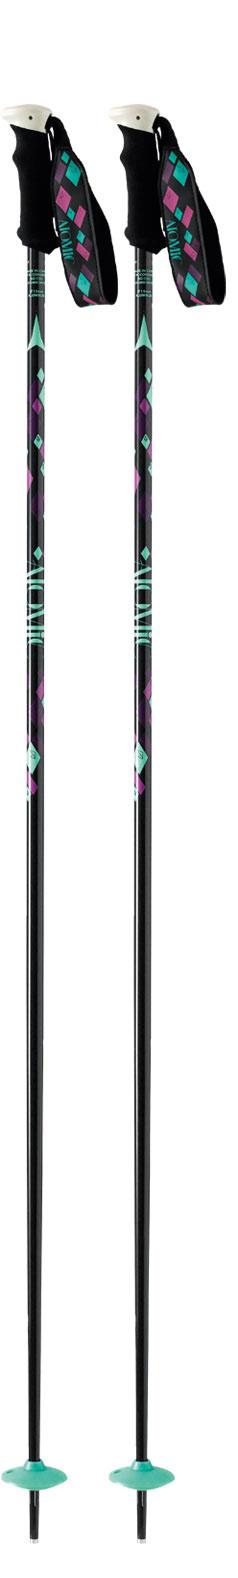 Atomic AMT3 W Black Ski Poles NEW !!  125cm